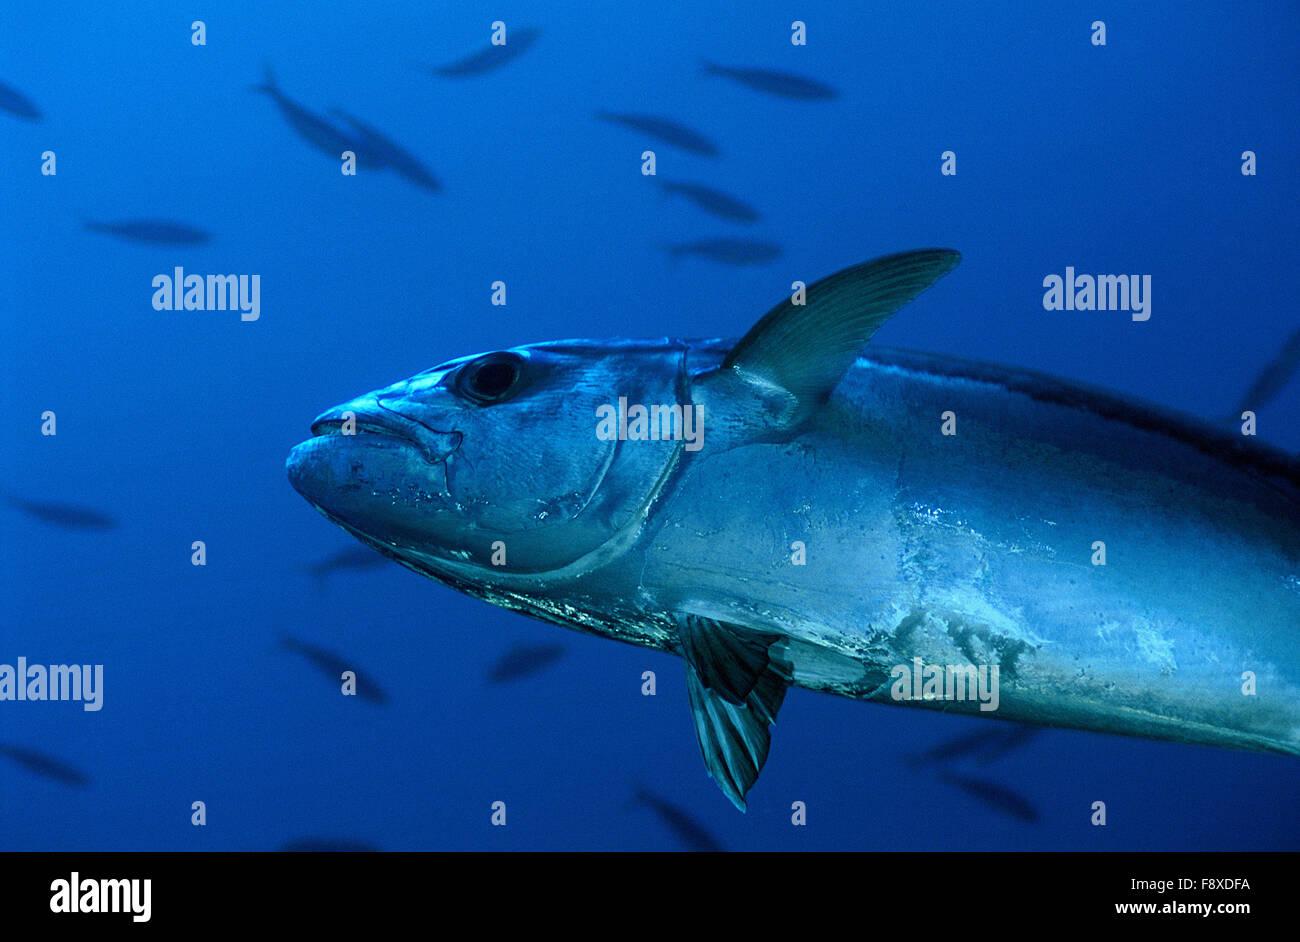 Dog-Toothed Tuna, Christmas Island, Republic of Kiribati - Stock Image